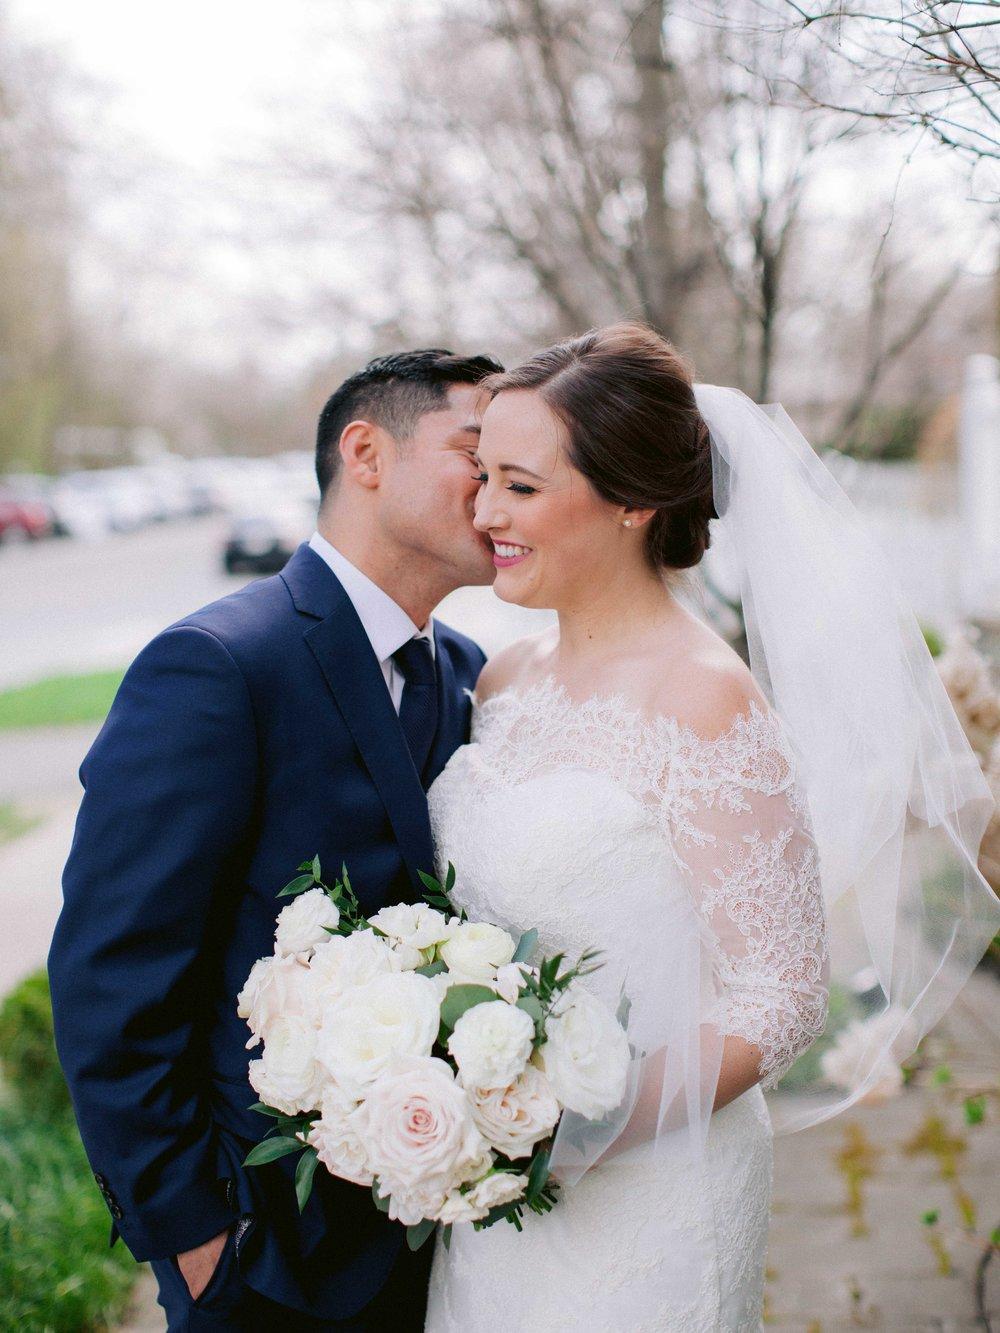 Niagara_on_the_lake_spring_wedding_kurtz_orpia_toronto_Vineyard_wedding_fine_art (53 of 92).jpg